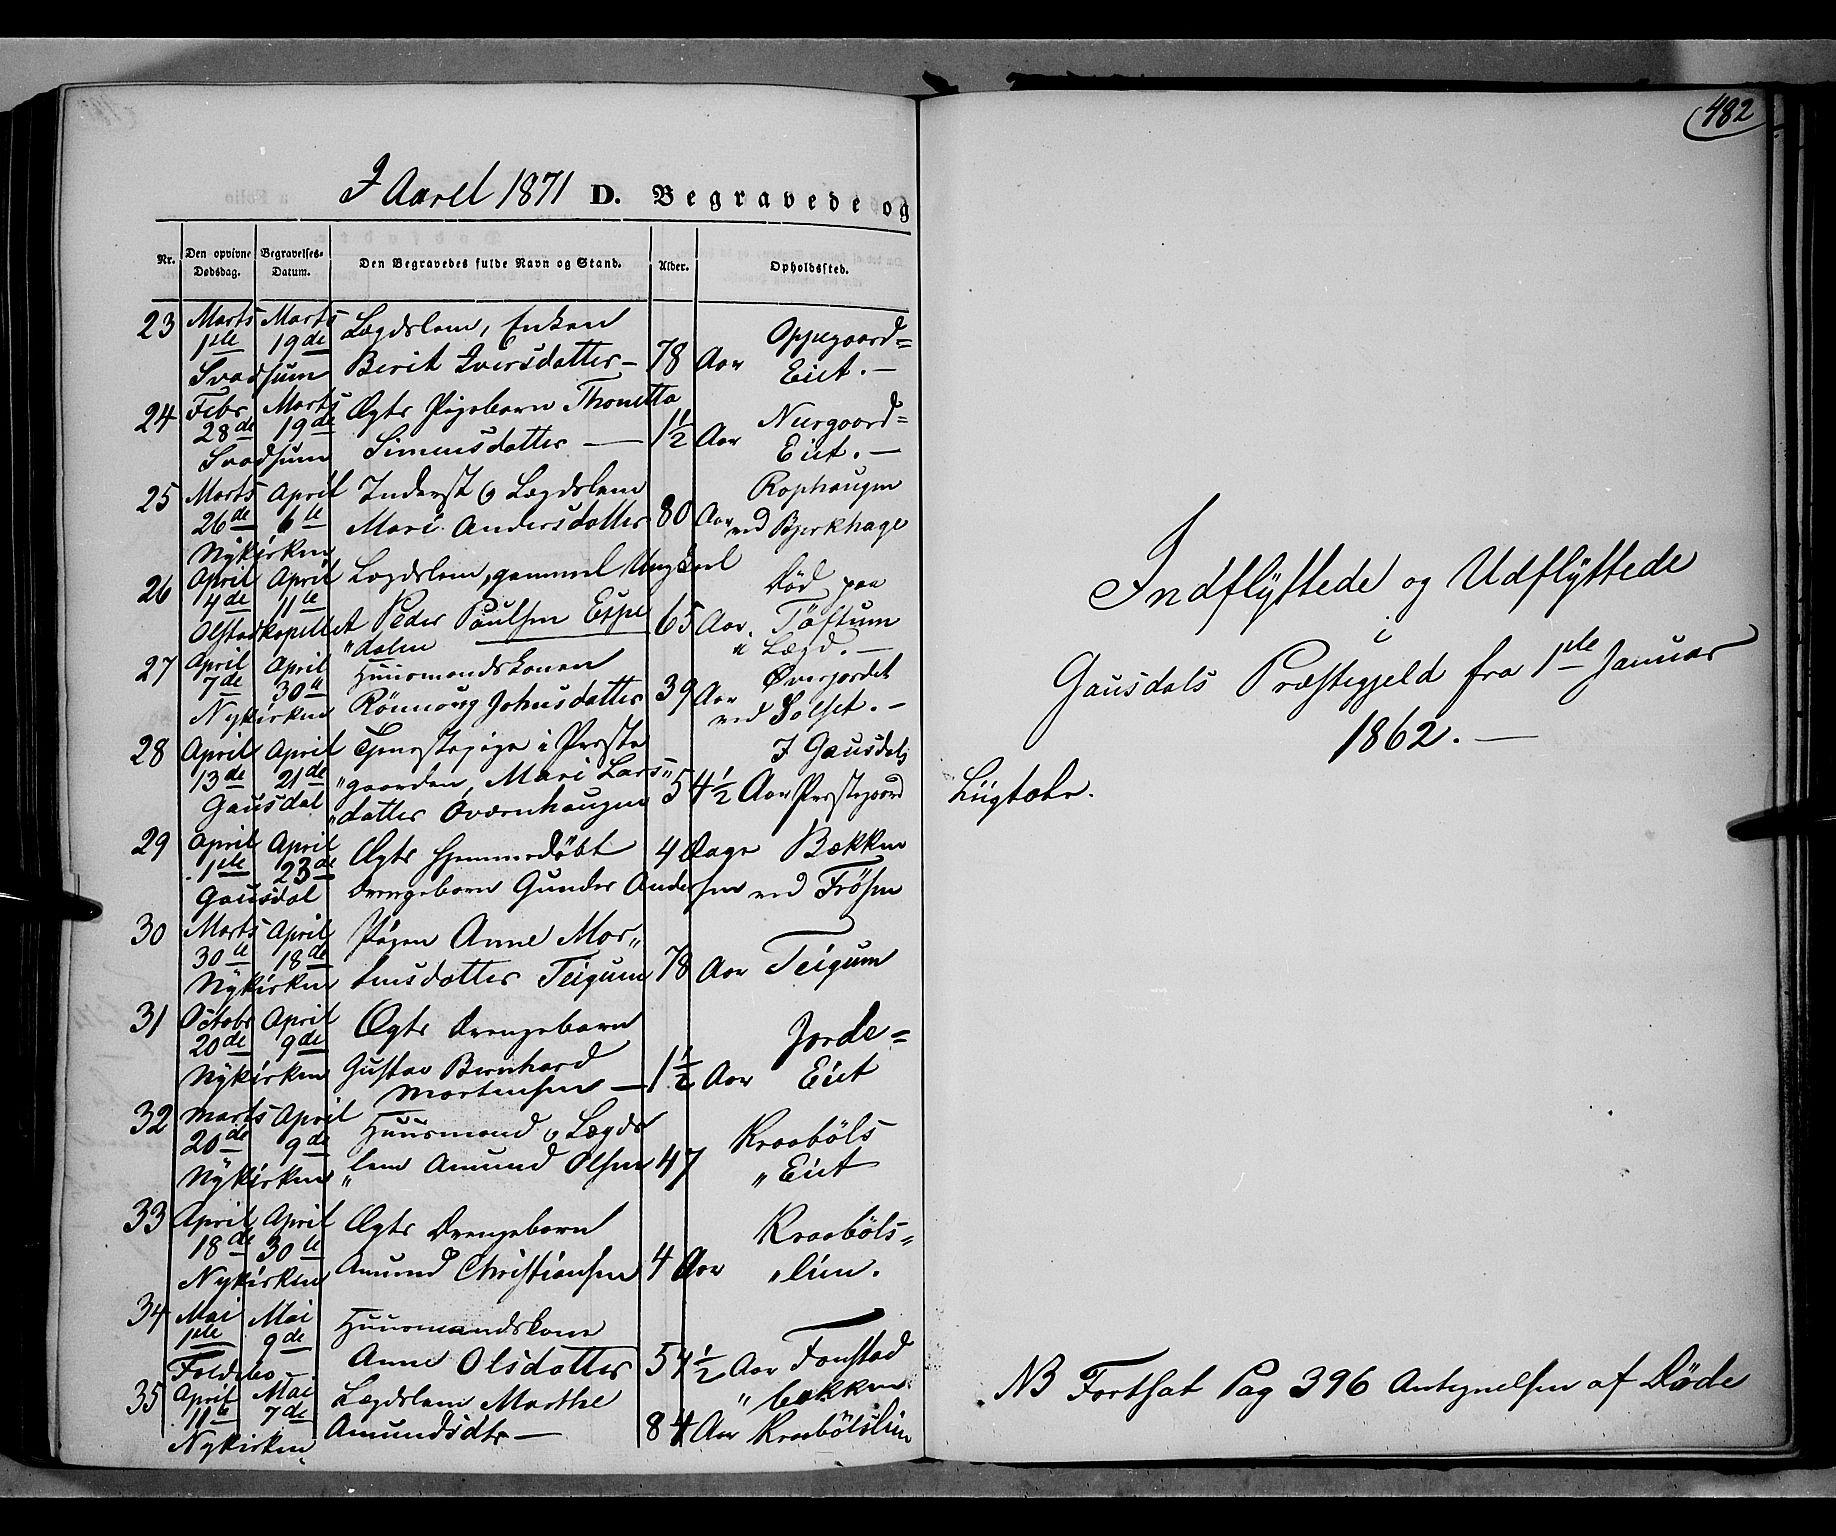 SAH, Gausdal prestekontor, Ministerialbok nr. 9, 1862-1873, s. 482